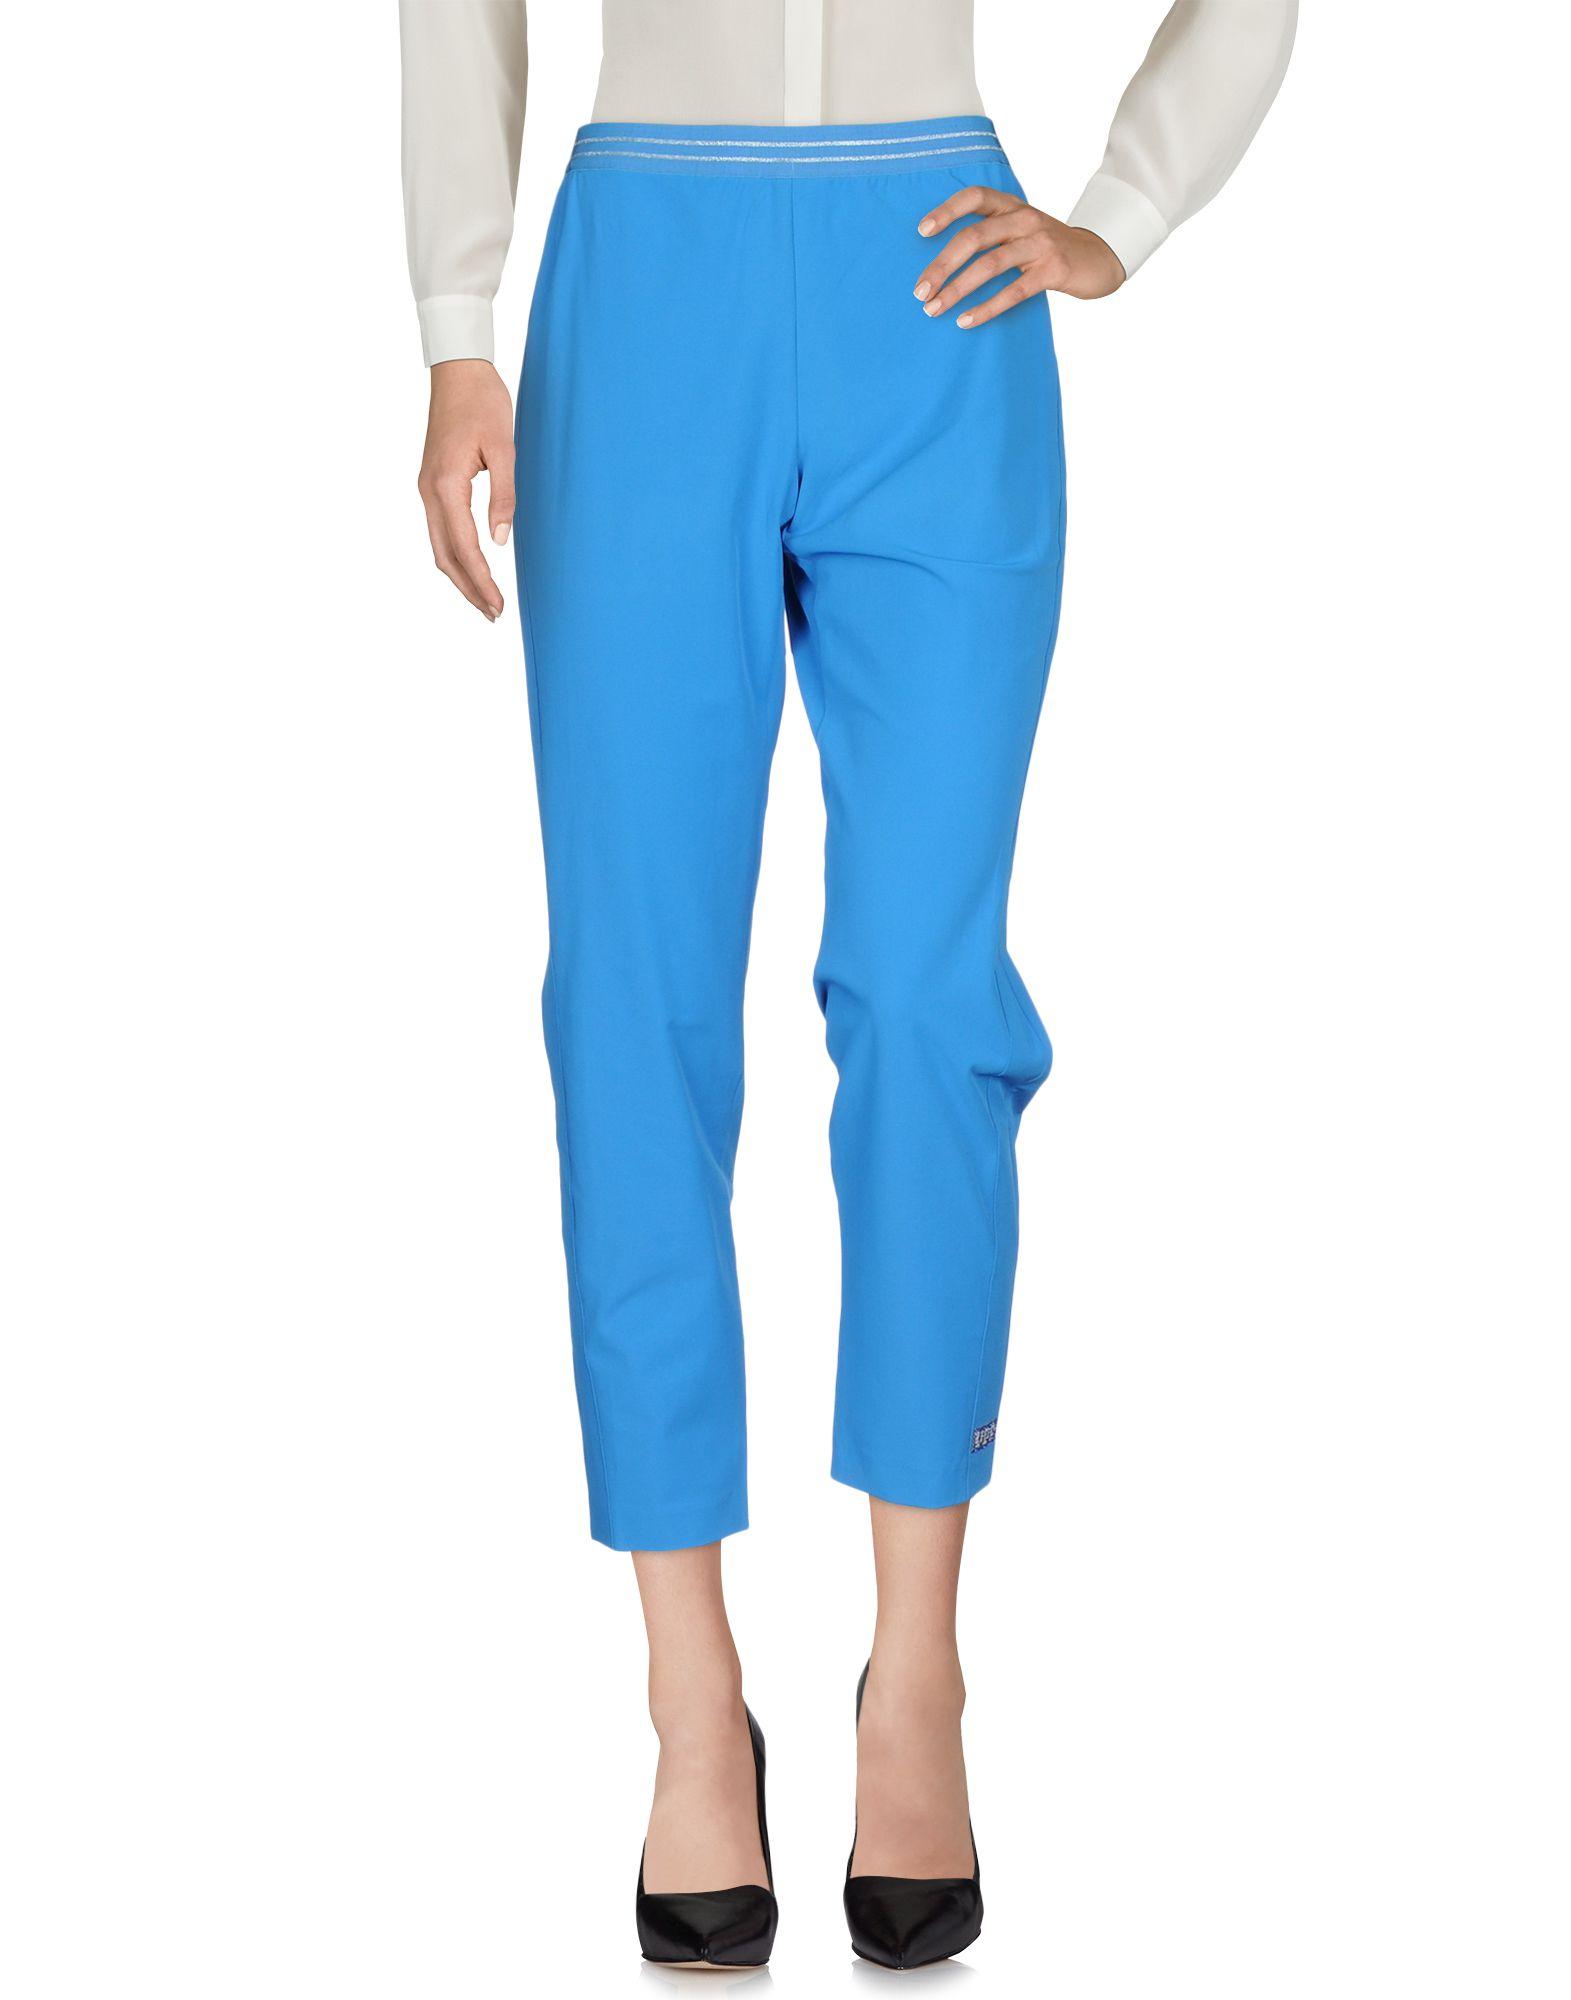 Pantalone Vdp Club Donna - Acquista online su